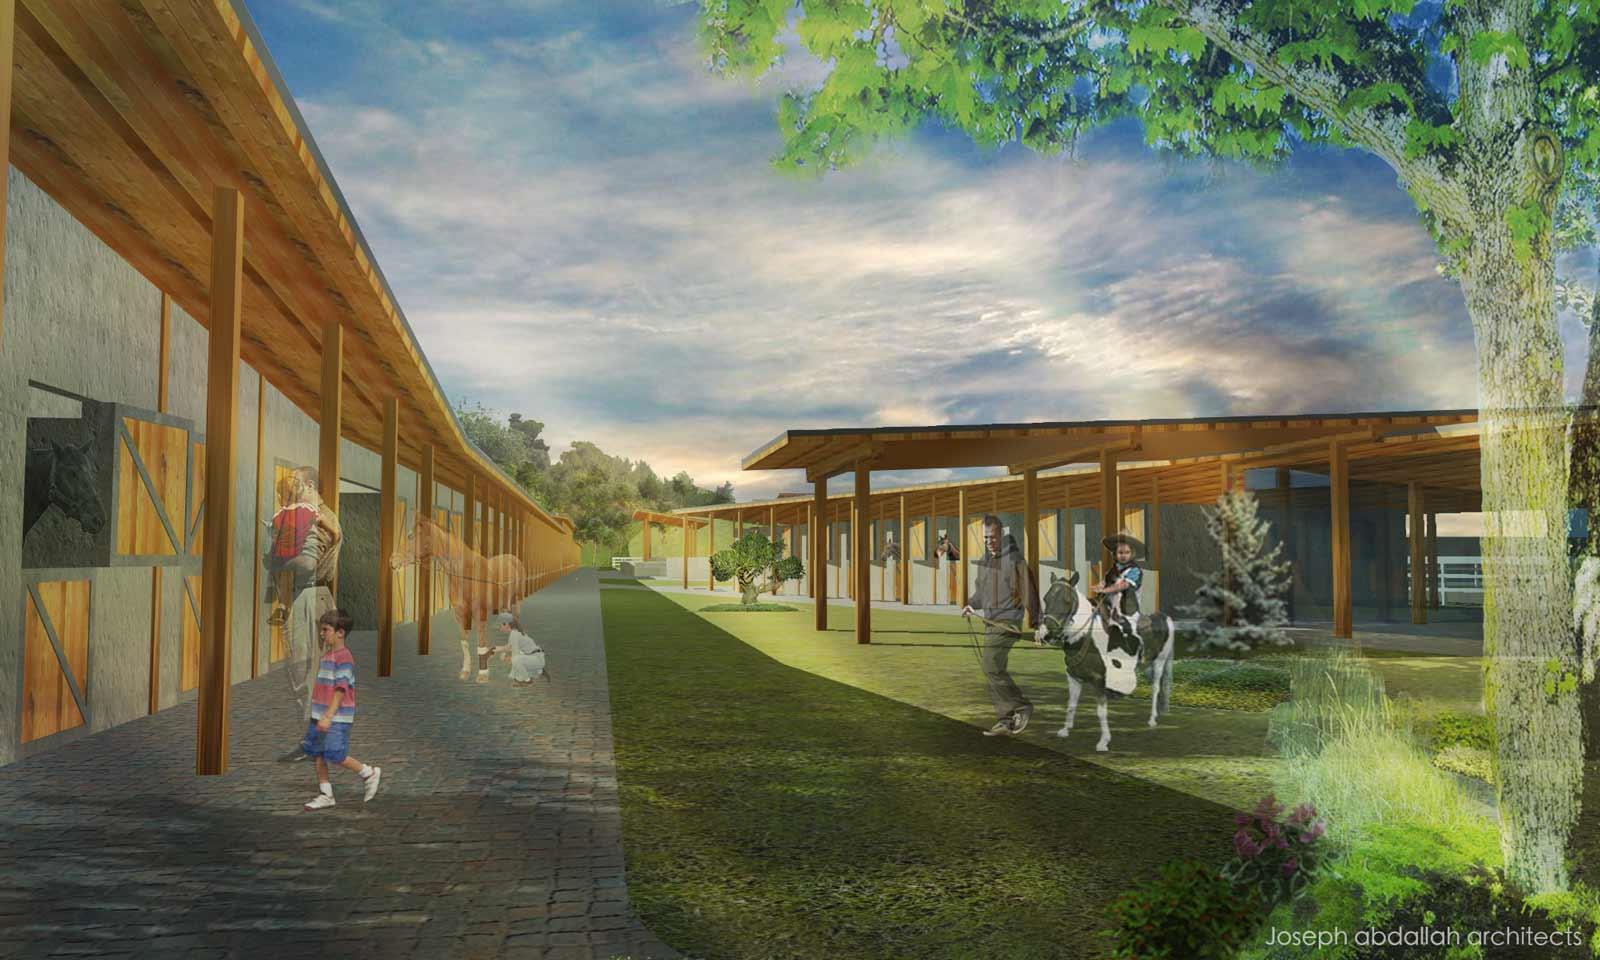 hechmi-equestrian-horse-back-riding-sport-lebanon-joseph-abdallah-architects-8